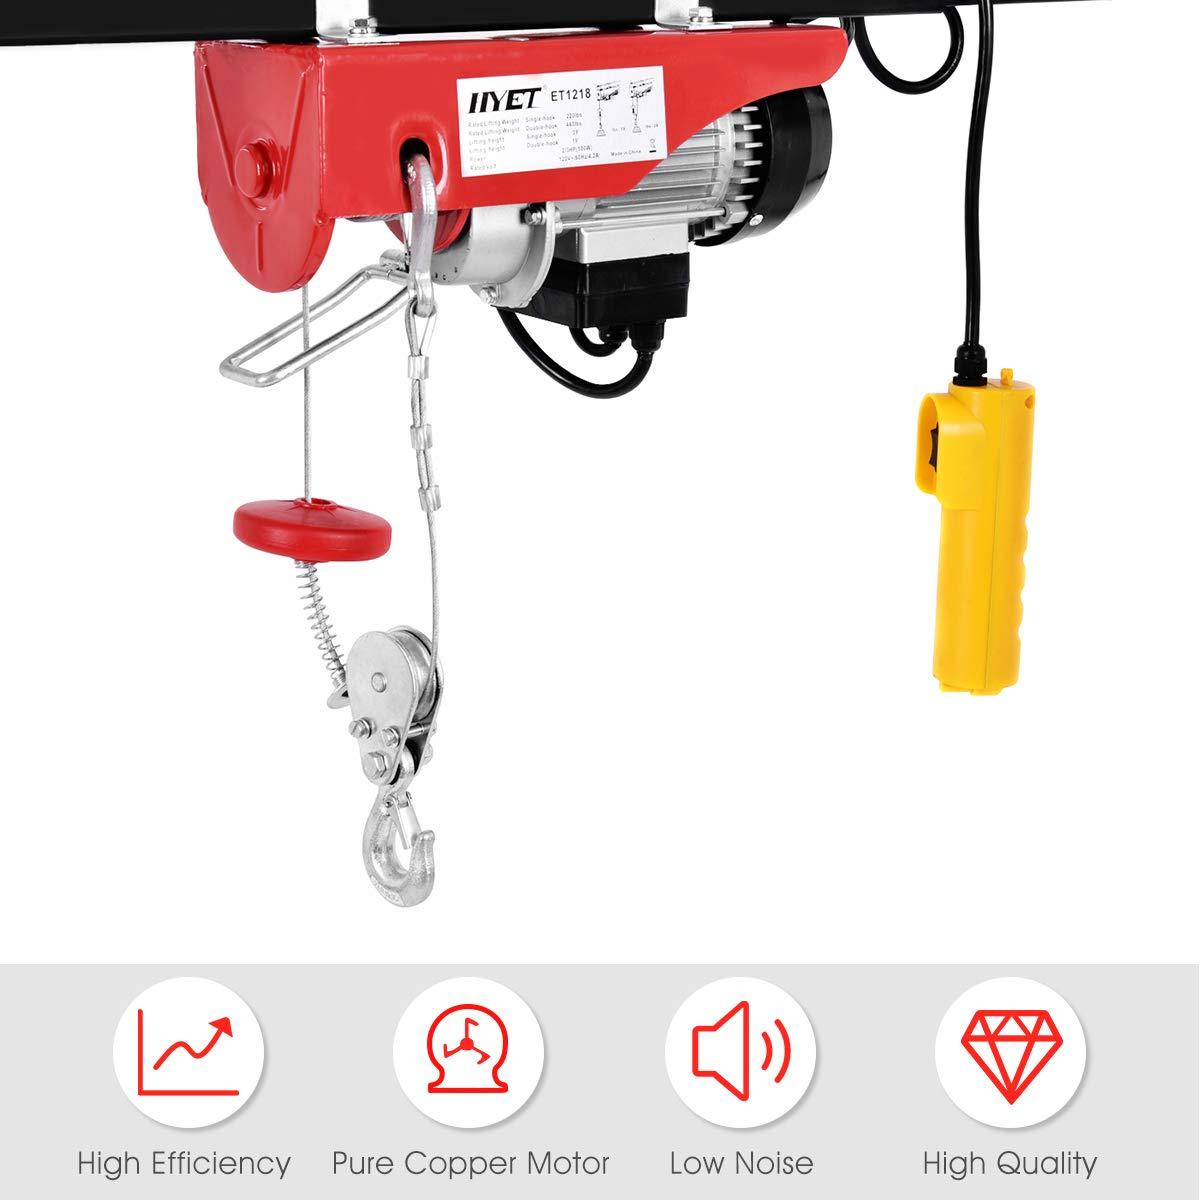 Amazon.com: Goplus Lift Electric Hoist Garage Auto Shop Electric Wire Hoist  Overhead Lift w/Remote Control (440LBS): Home Improvement